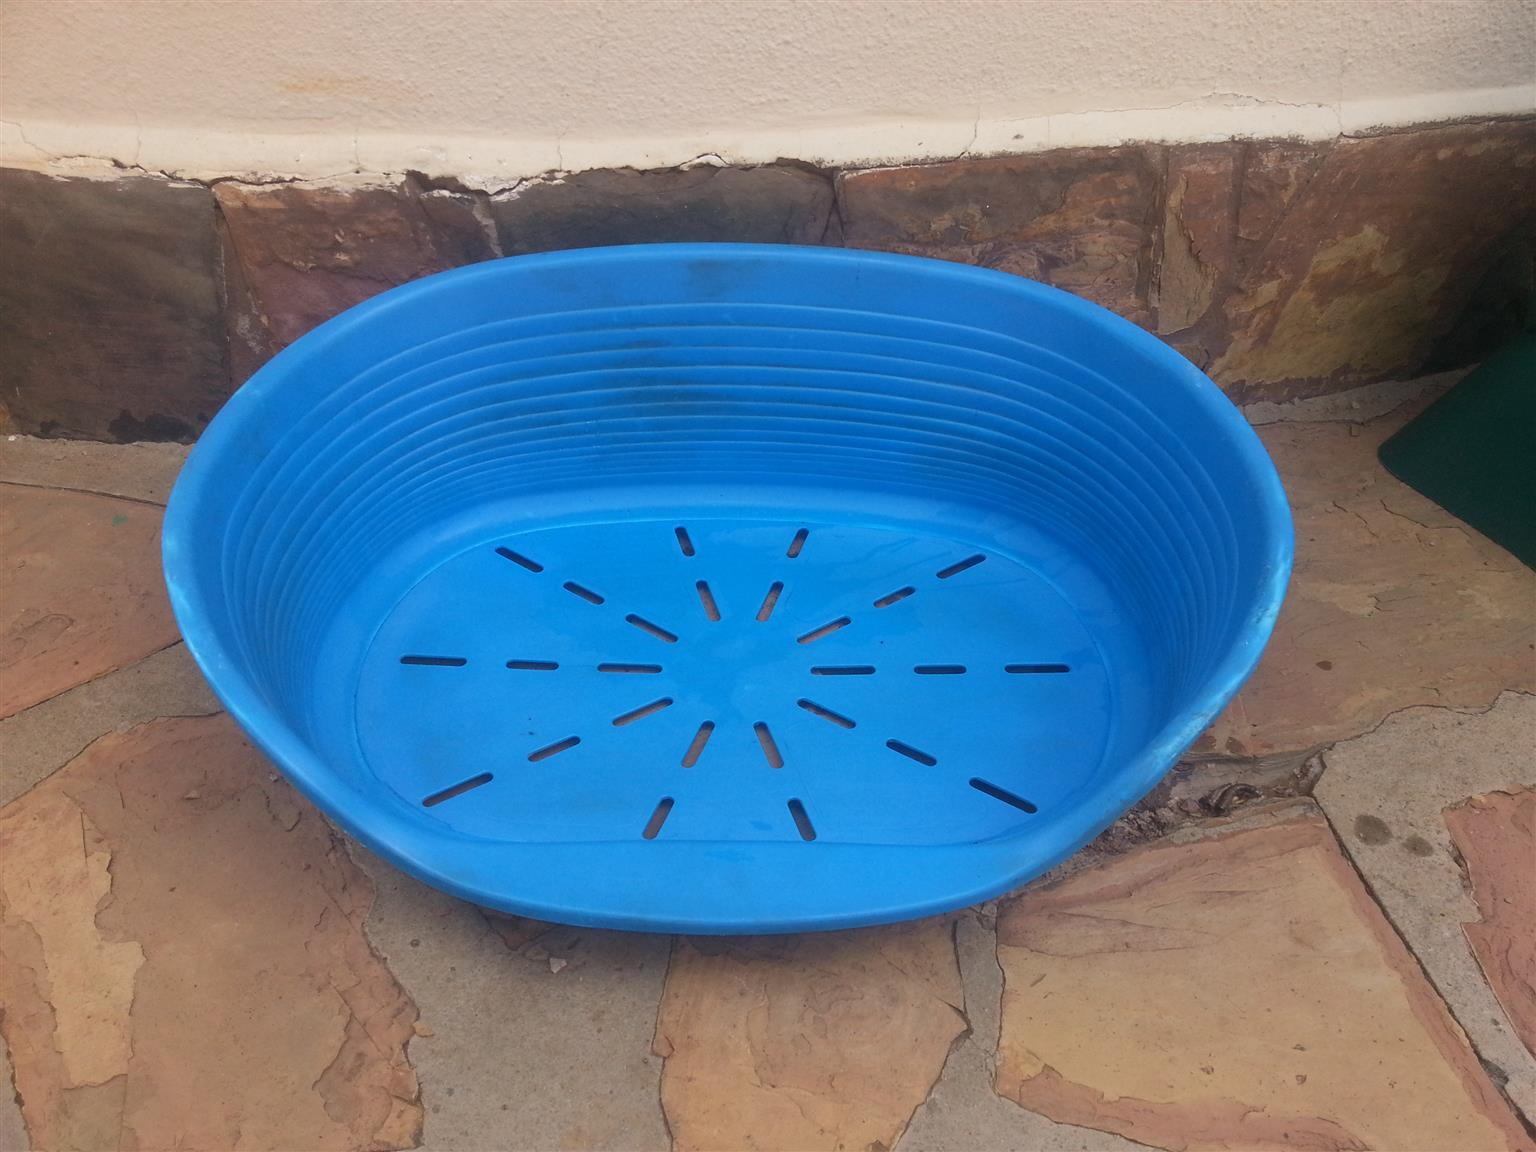 Plastic dog baskets